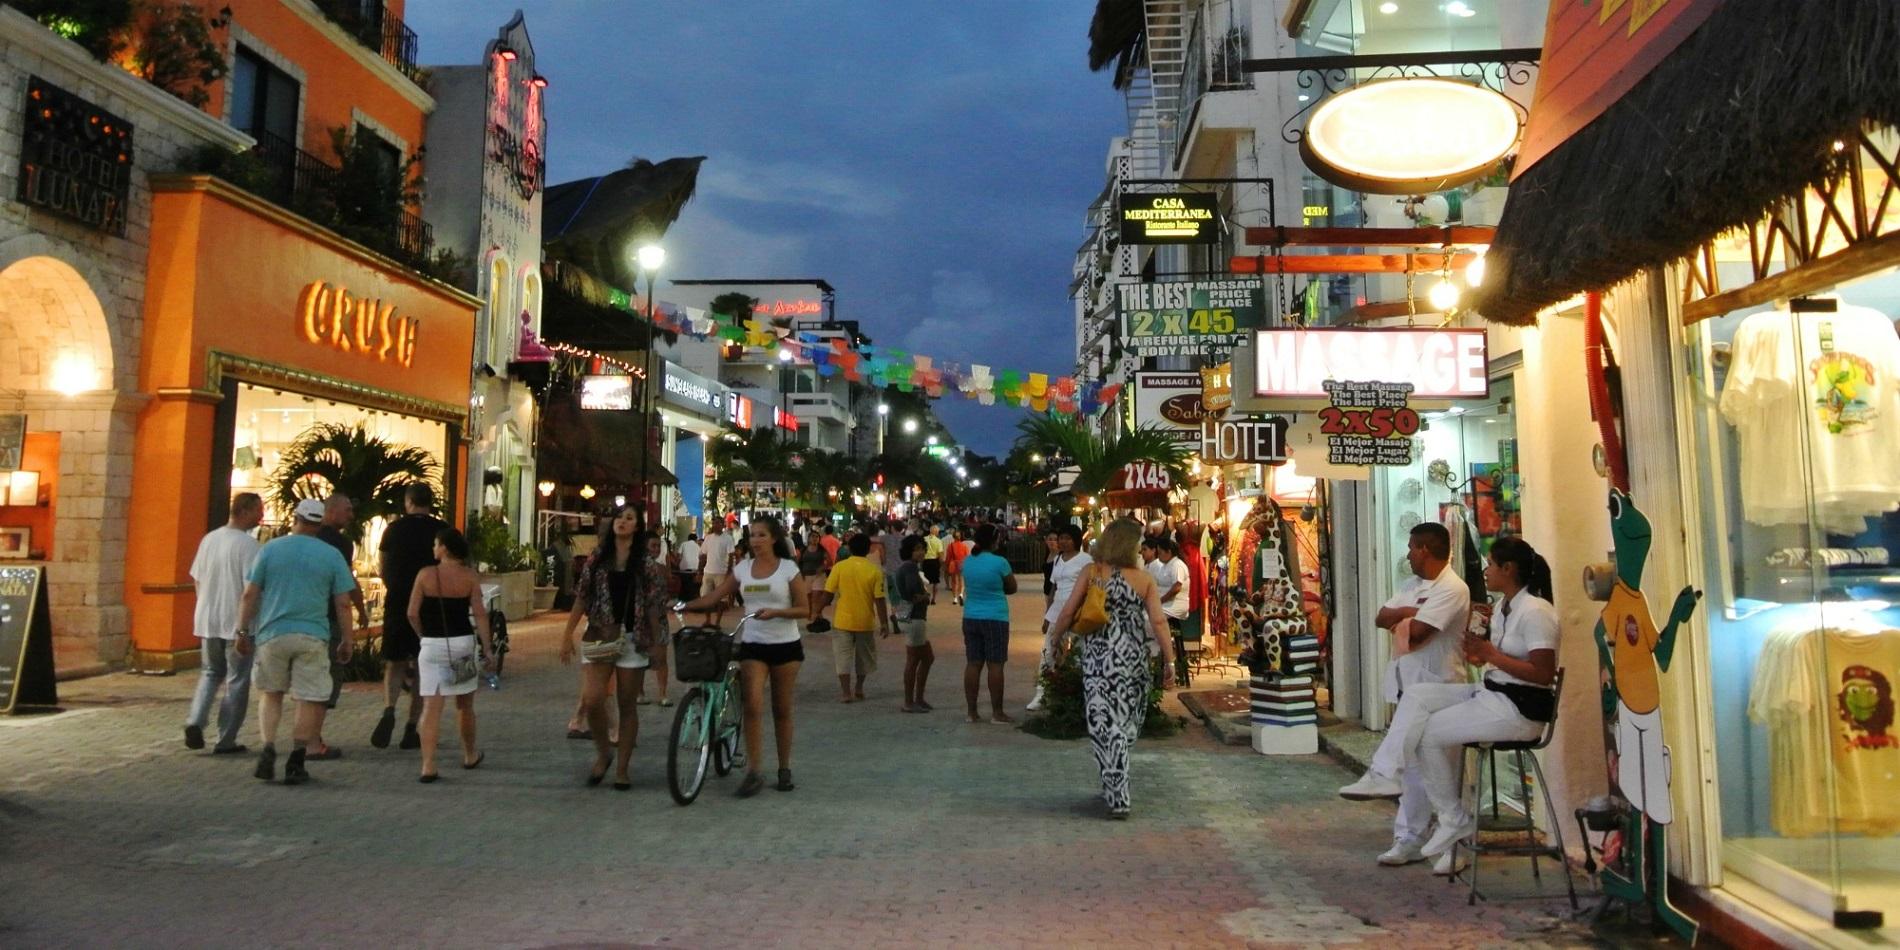 vita notturna, ristoranti e shopping a Playa del Carmen